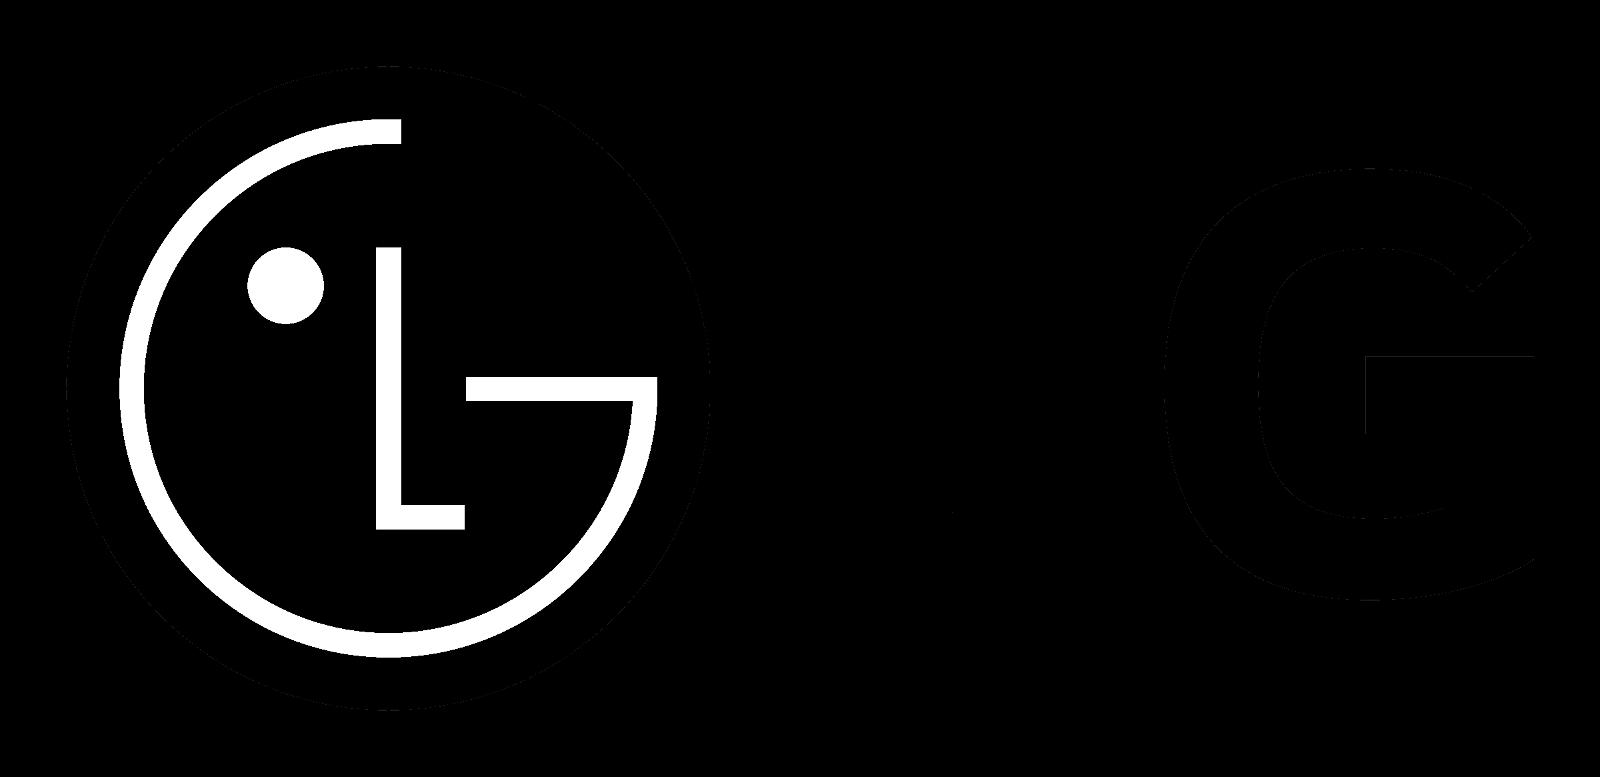 LG V60 5G ThinQ Dual Screen Review 1